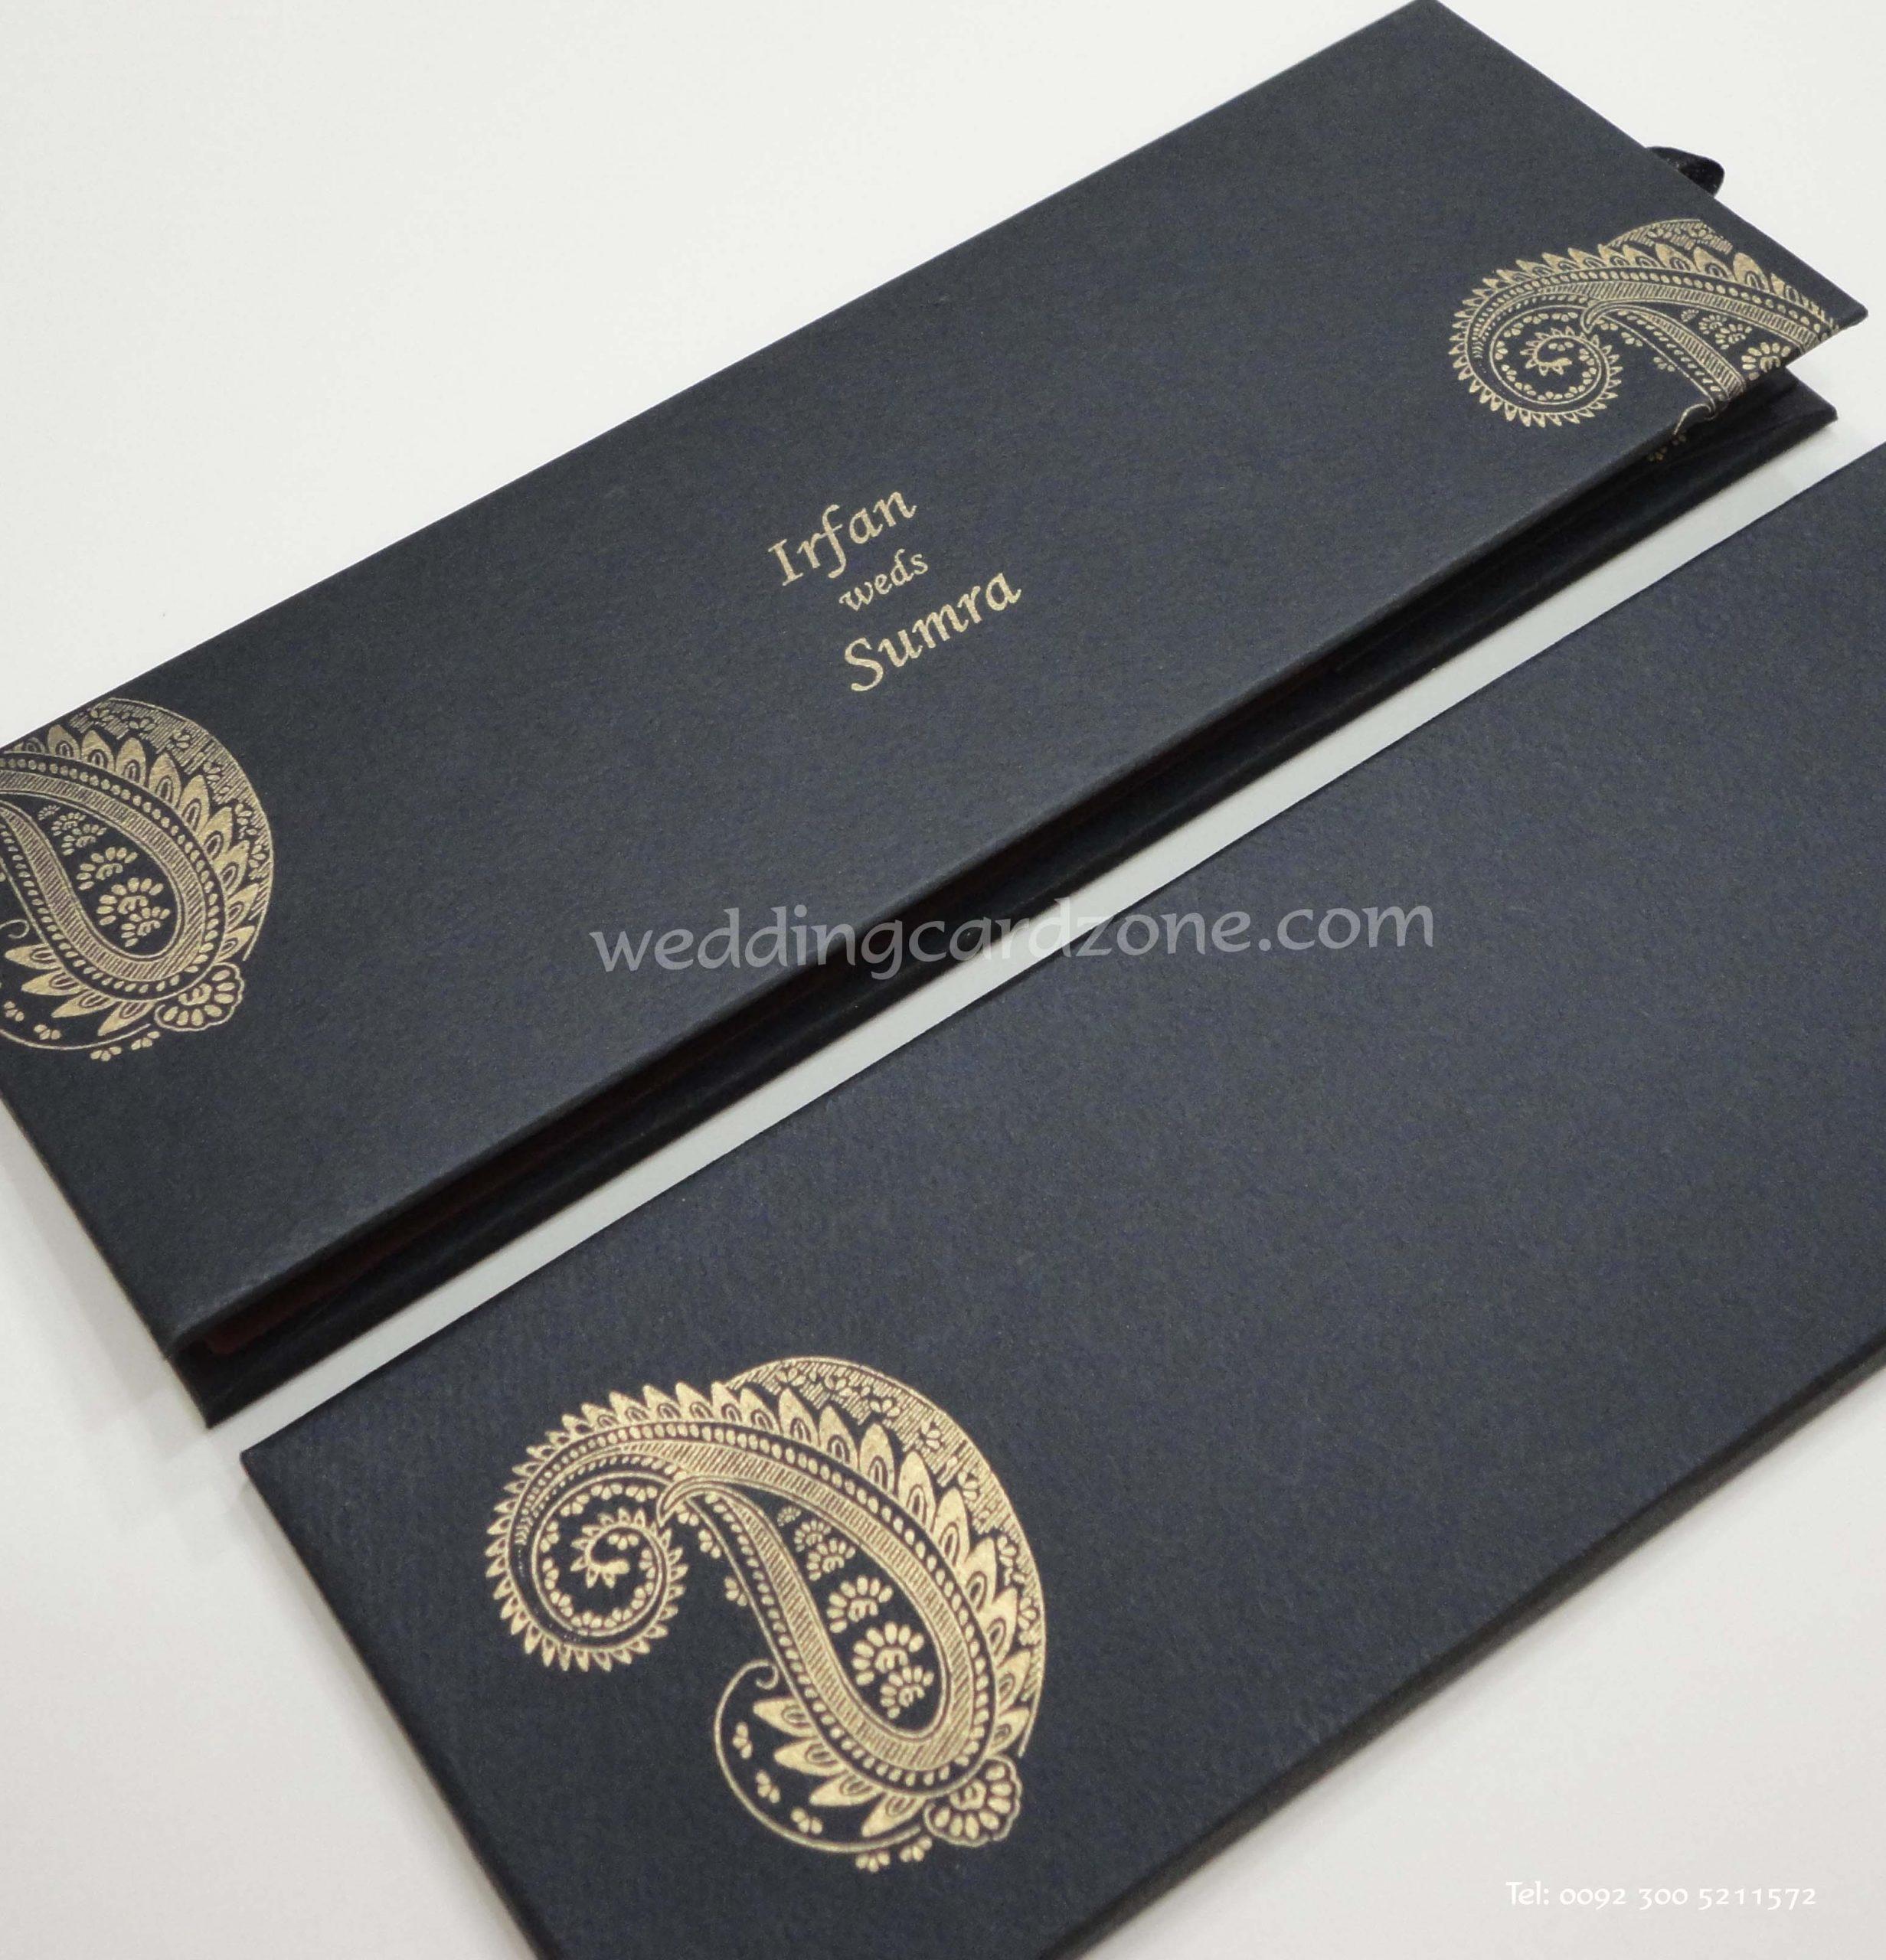 Pakistani Wedding Cards Wedding Cards Collection Pakistan Muslim Wedding Cards Scroll Invitations